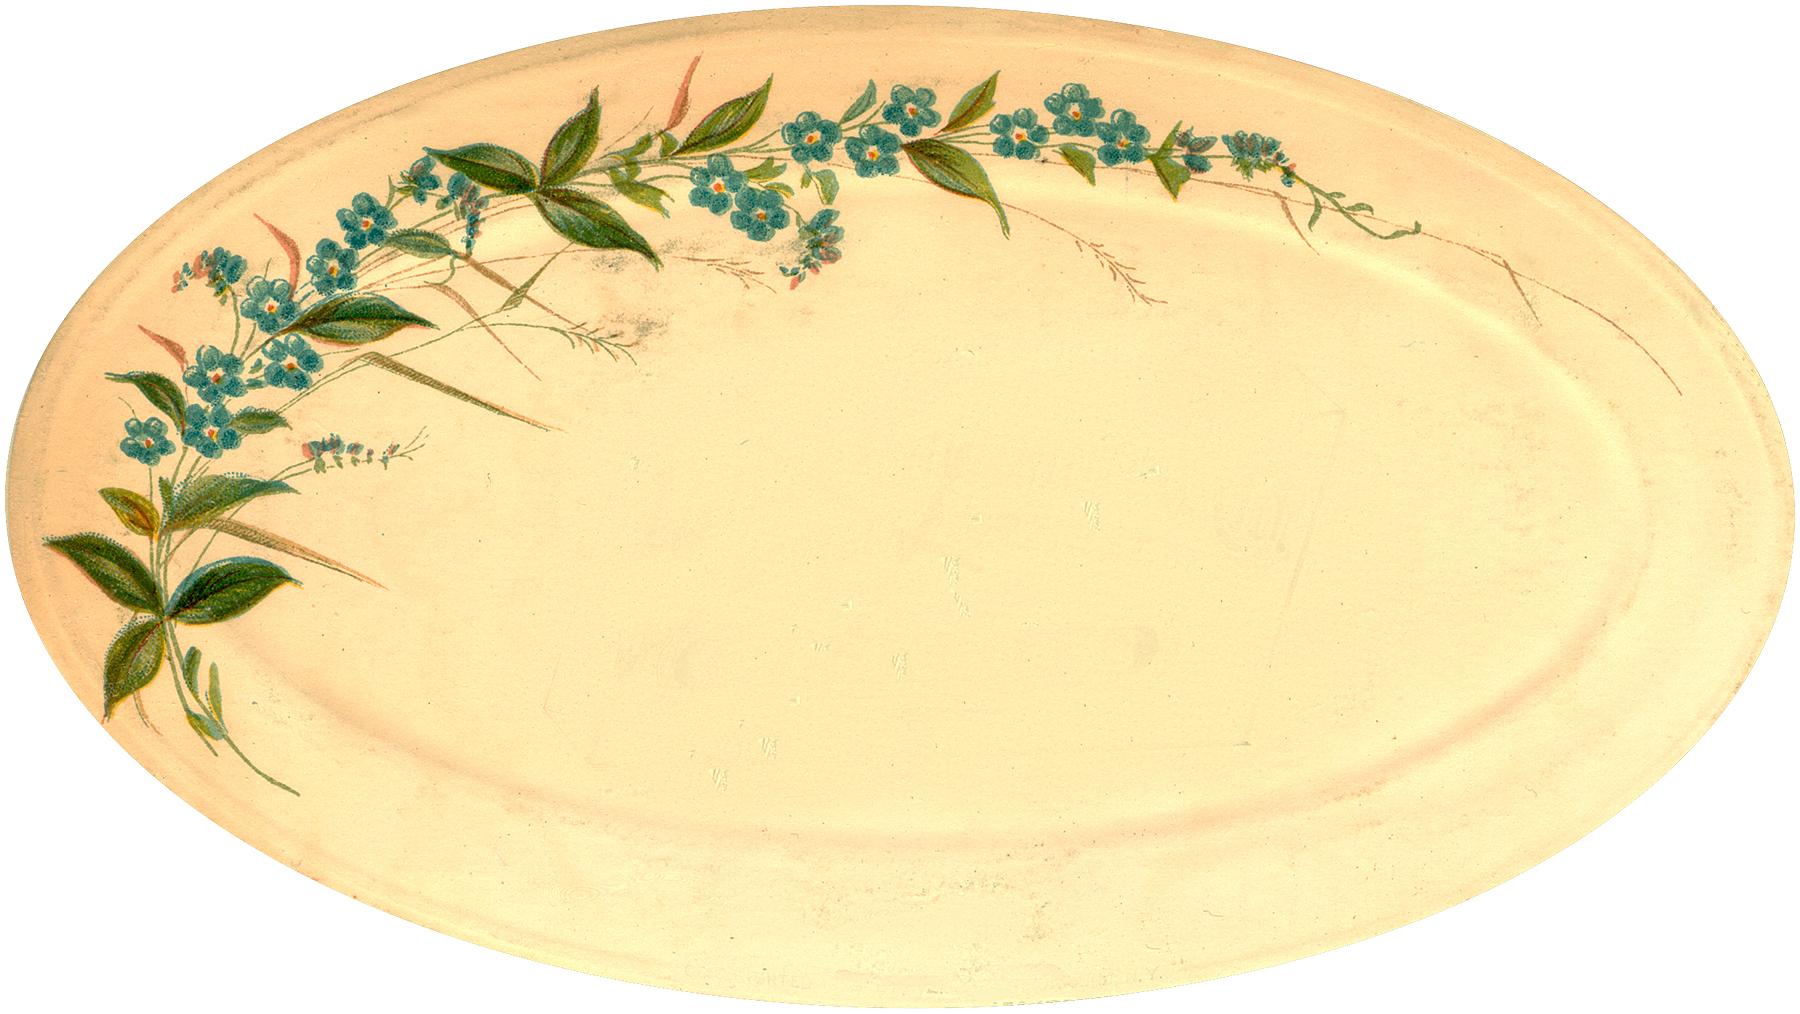 Vintage China Platter Image